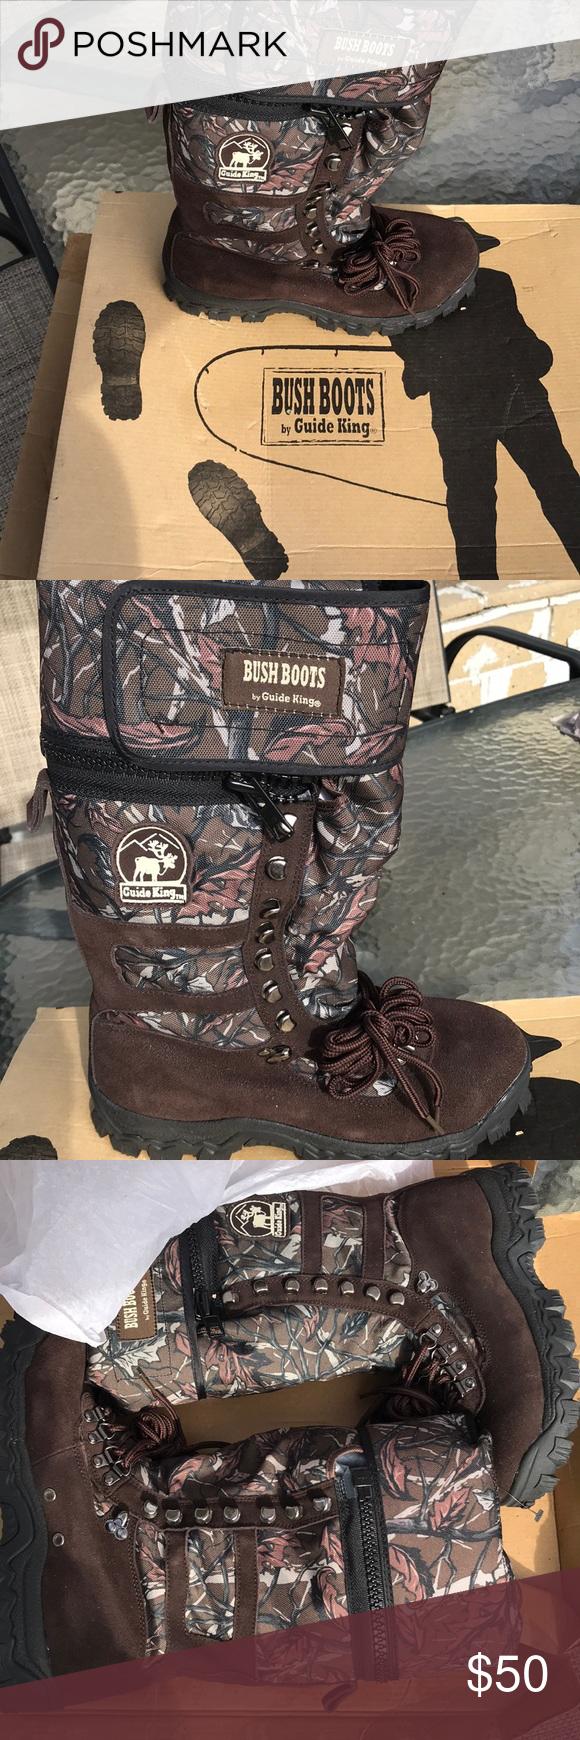 Bush boots 👢 by guide king nwt | my posh picks | pinterest.